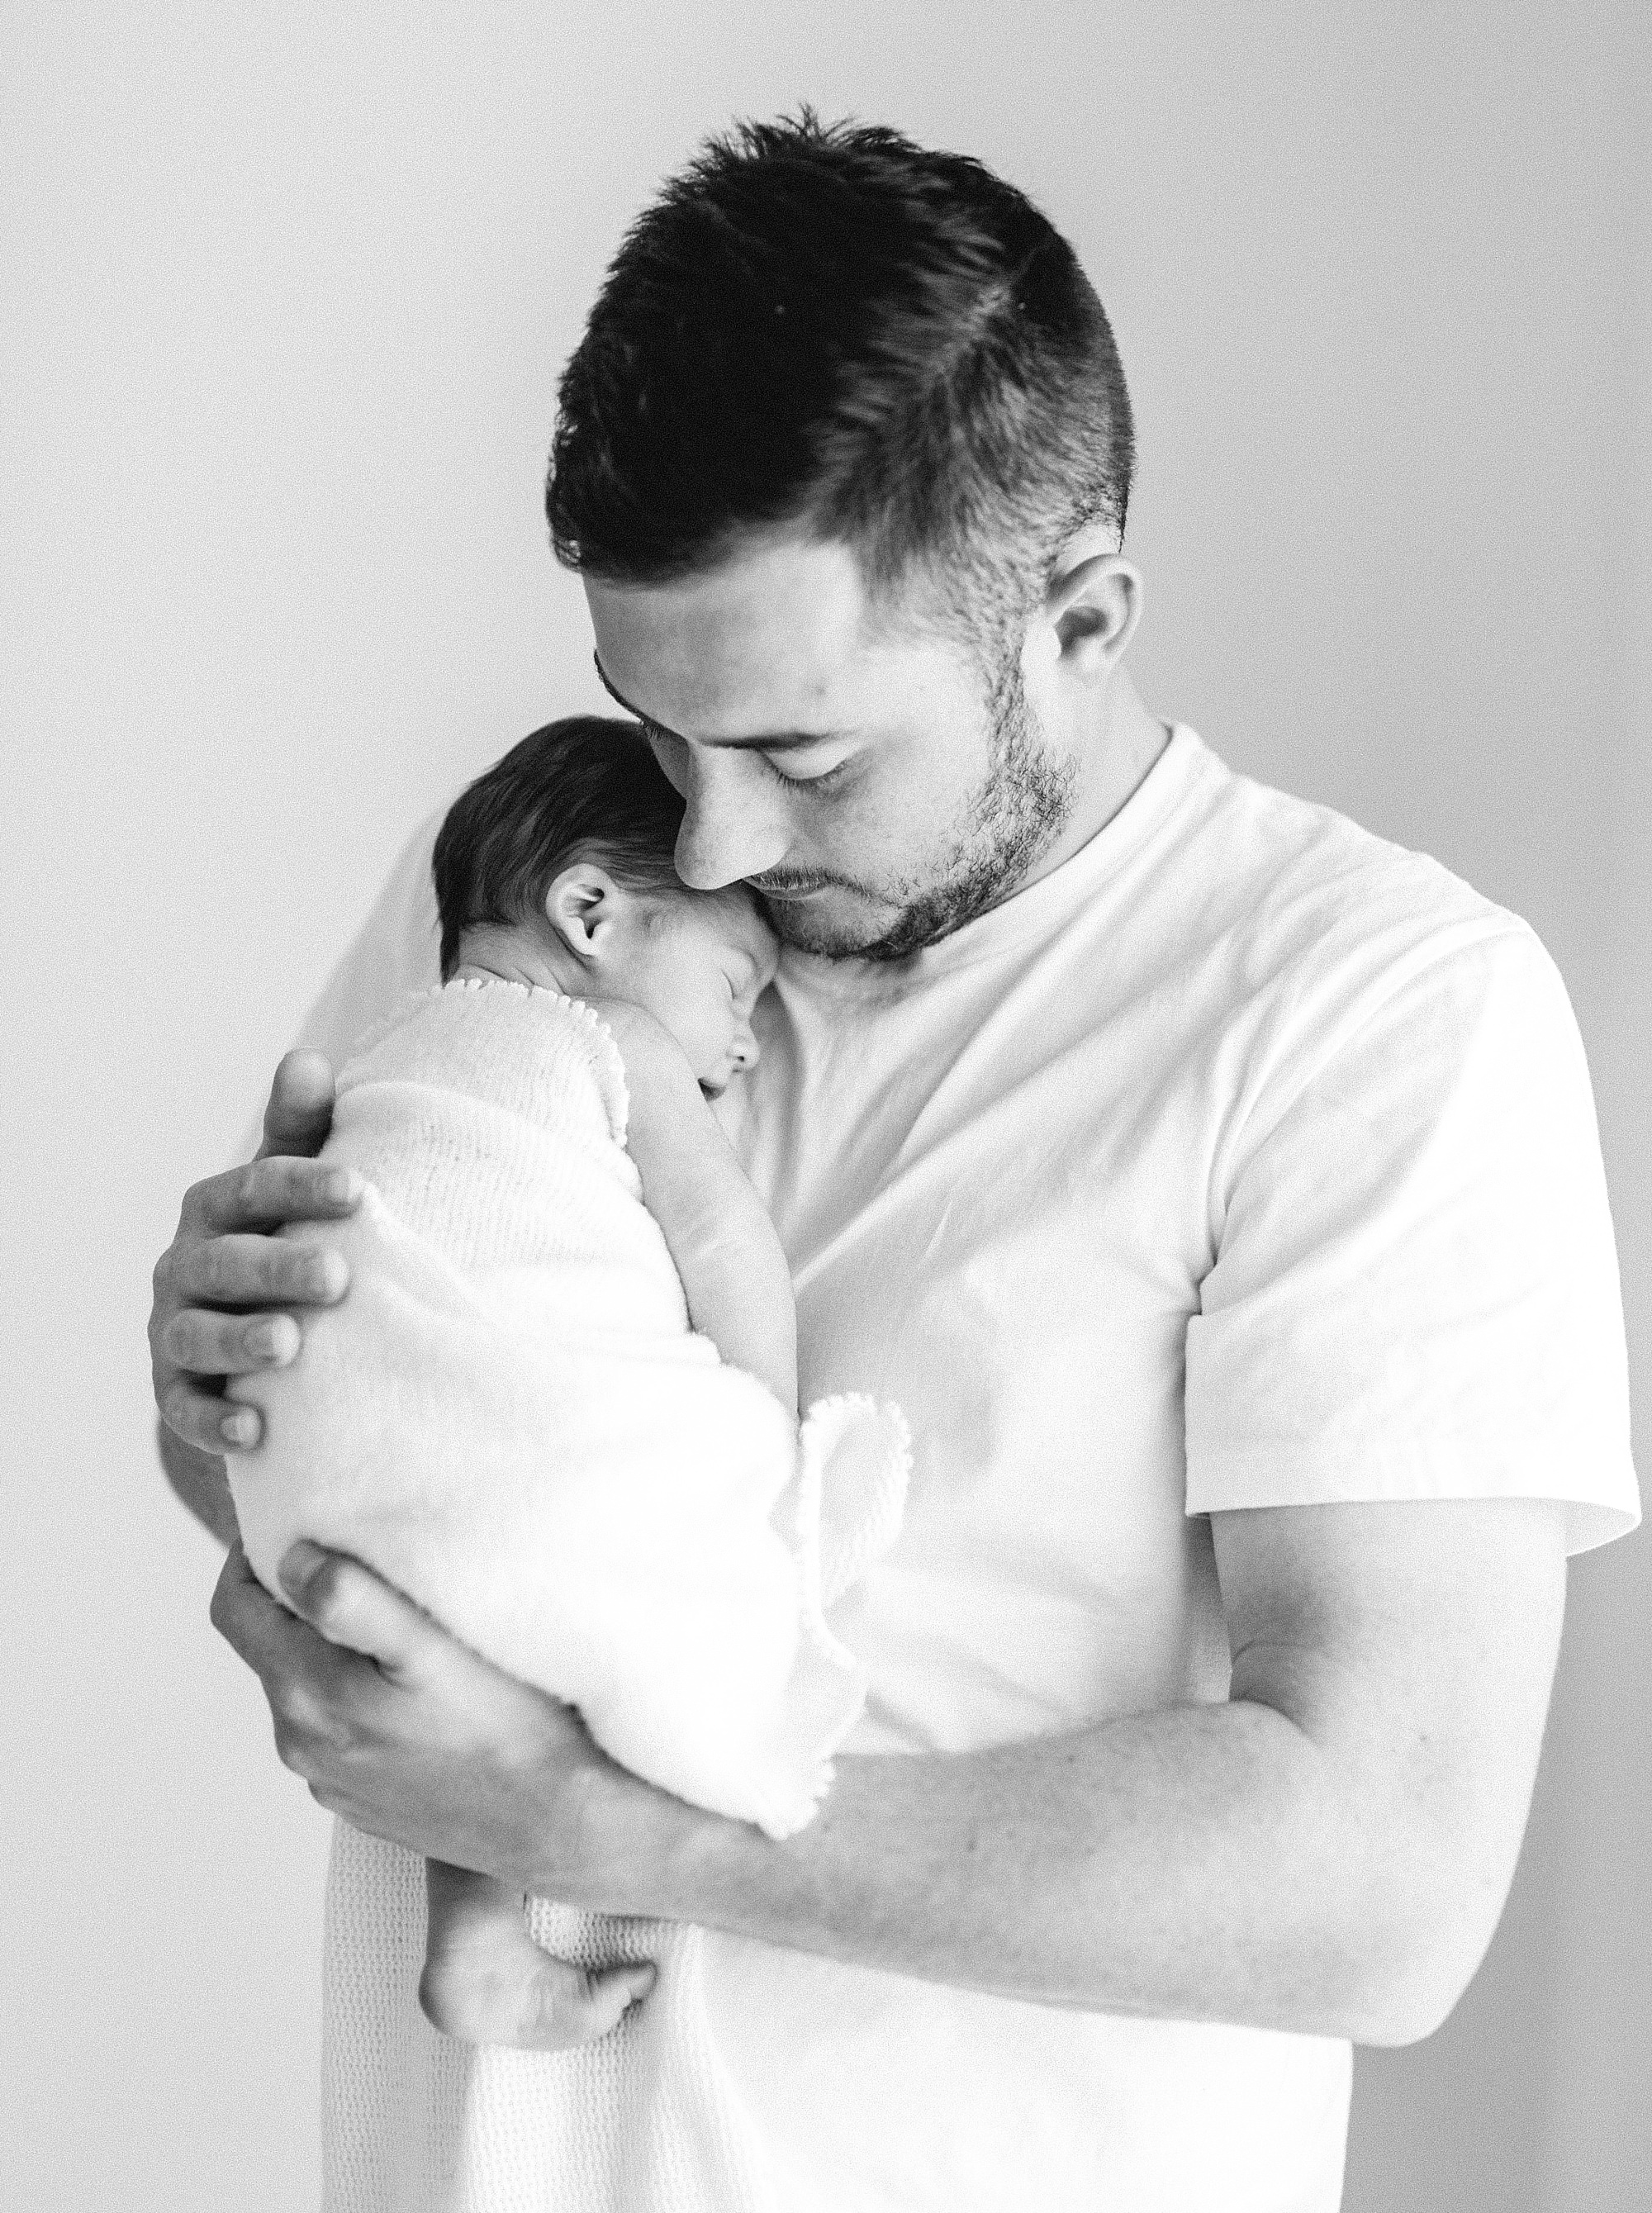 West Melbourne Point Cook Newborn Photographer 021.JPG